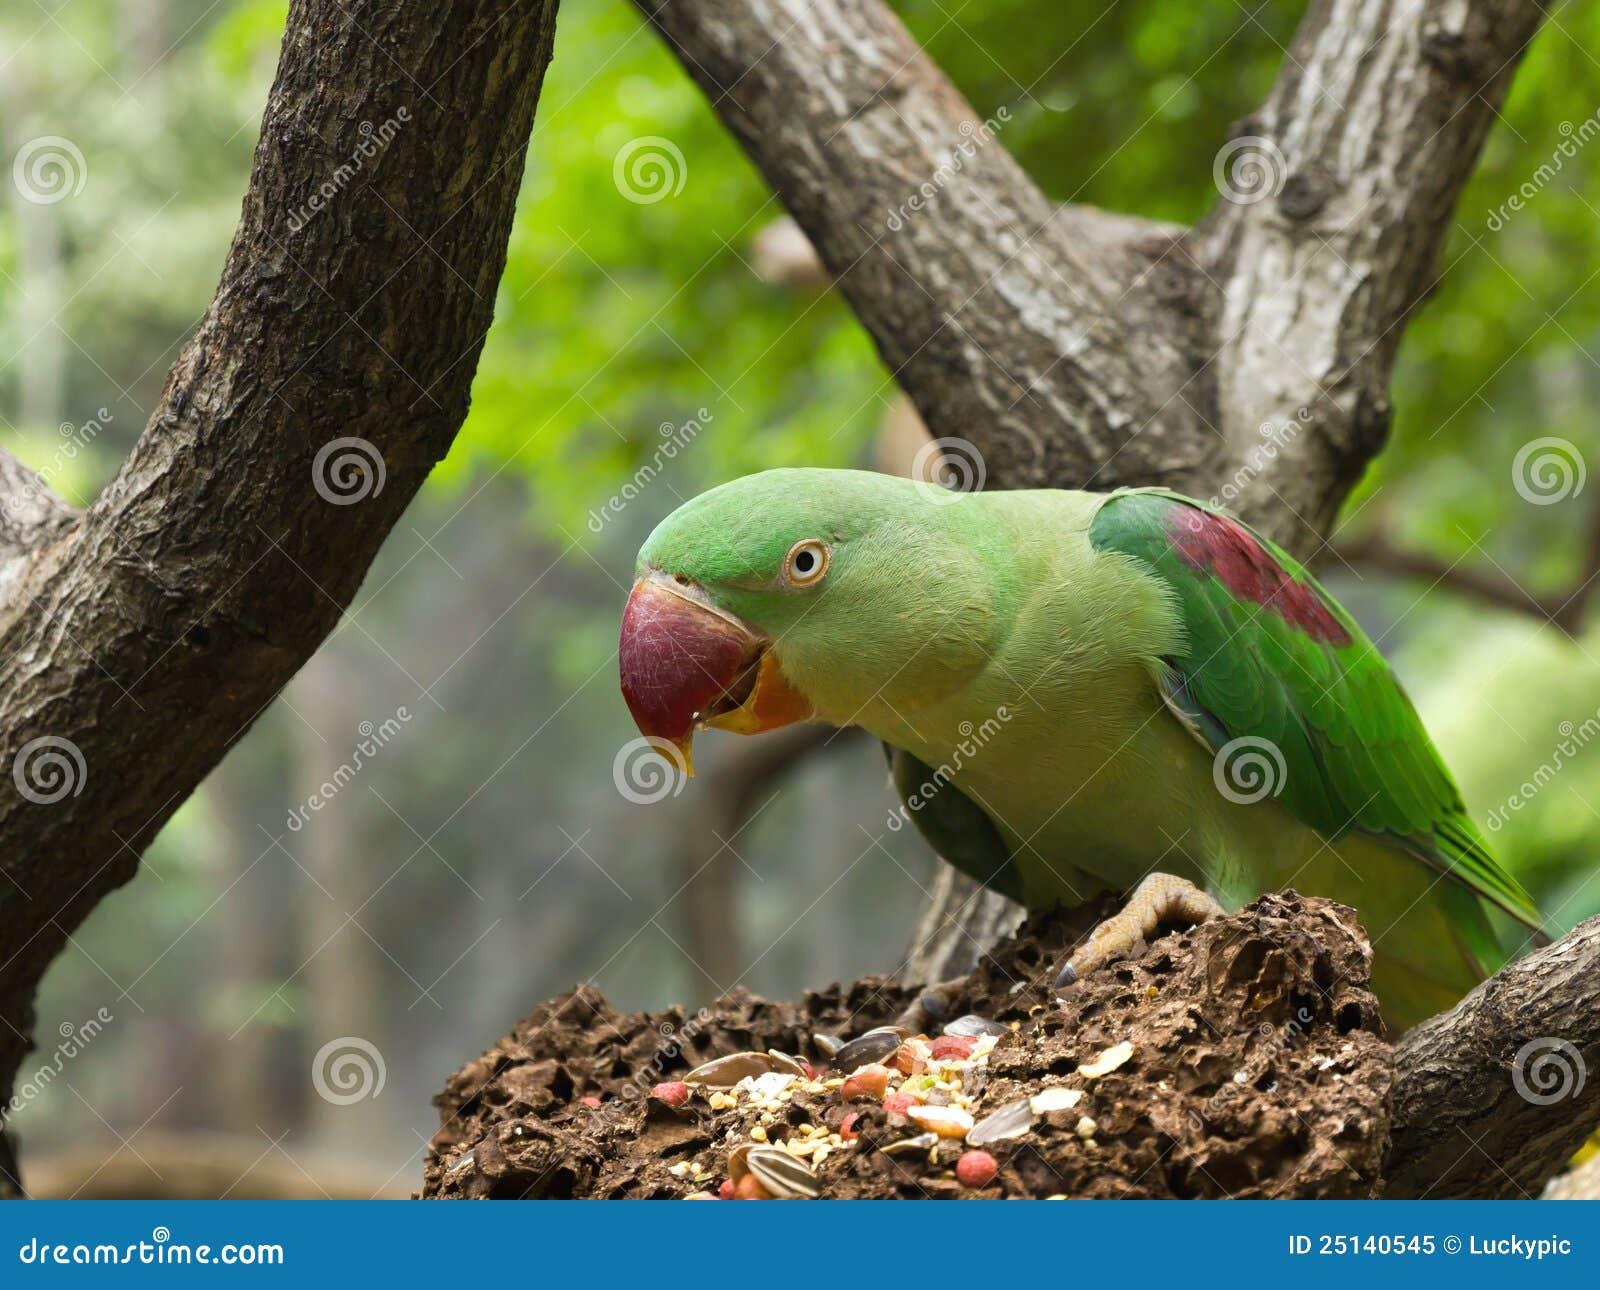 Green Parrot Bird Eating Grains Royalty Free Stock Photo